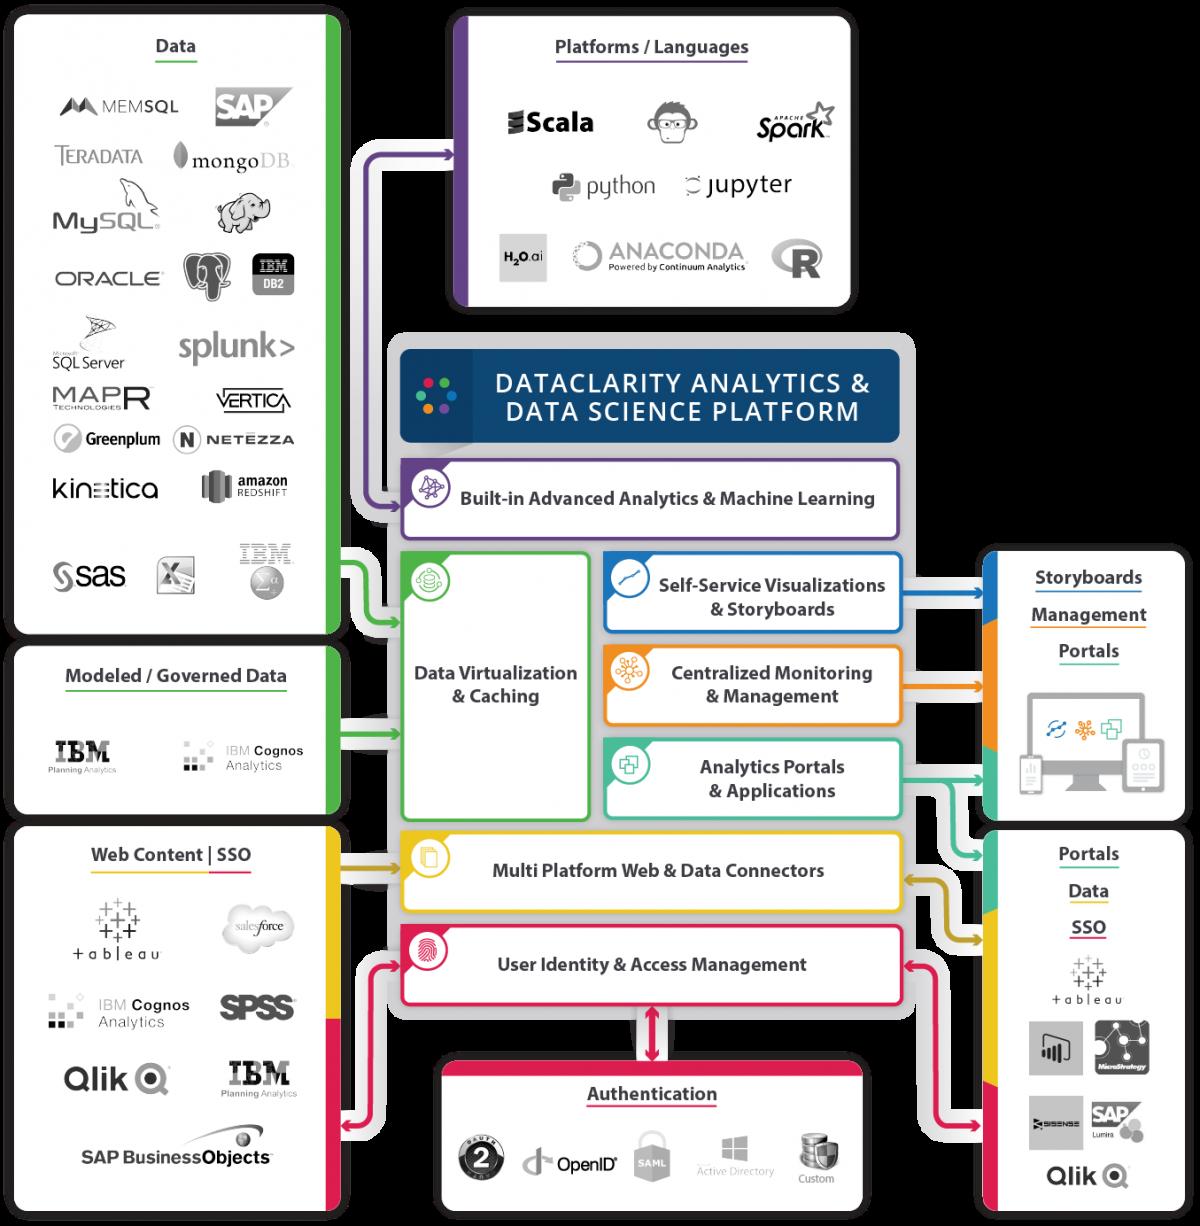 DataClarity-Analytics-and-Data-Science-Platform